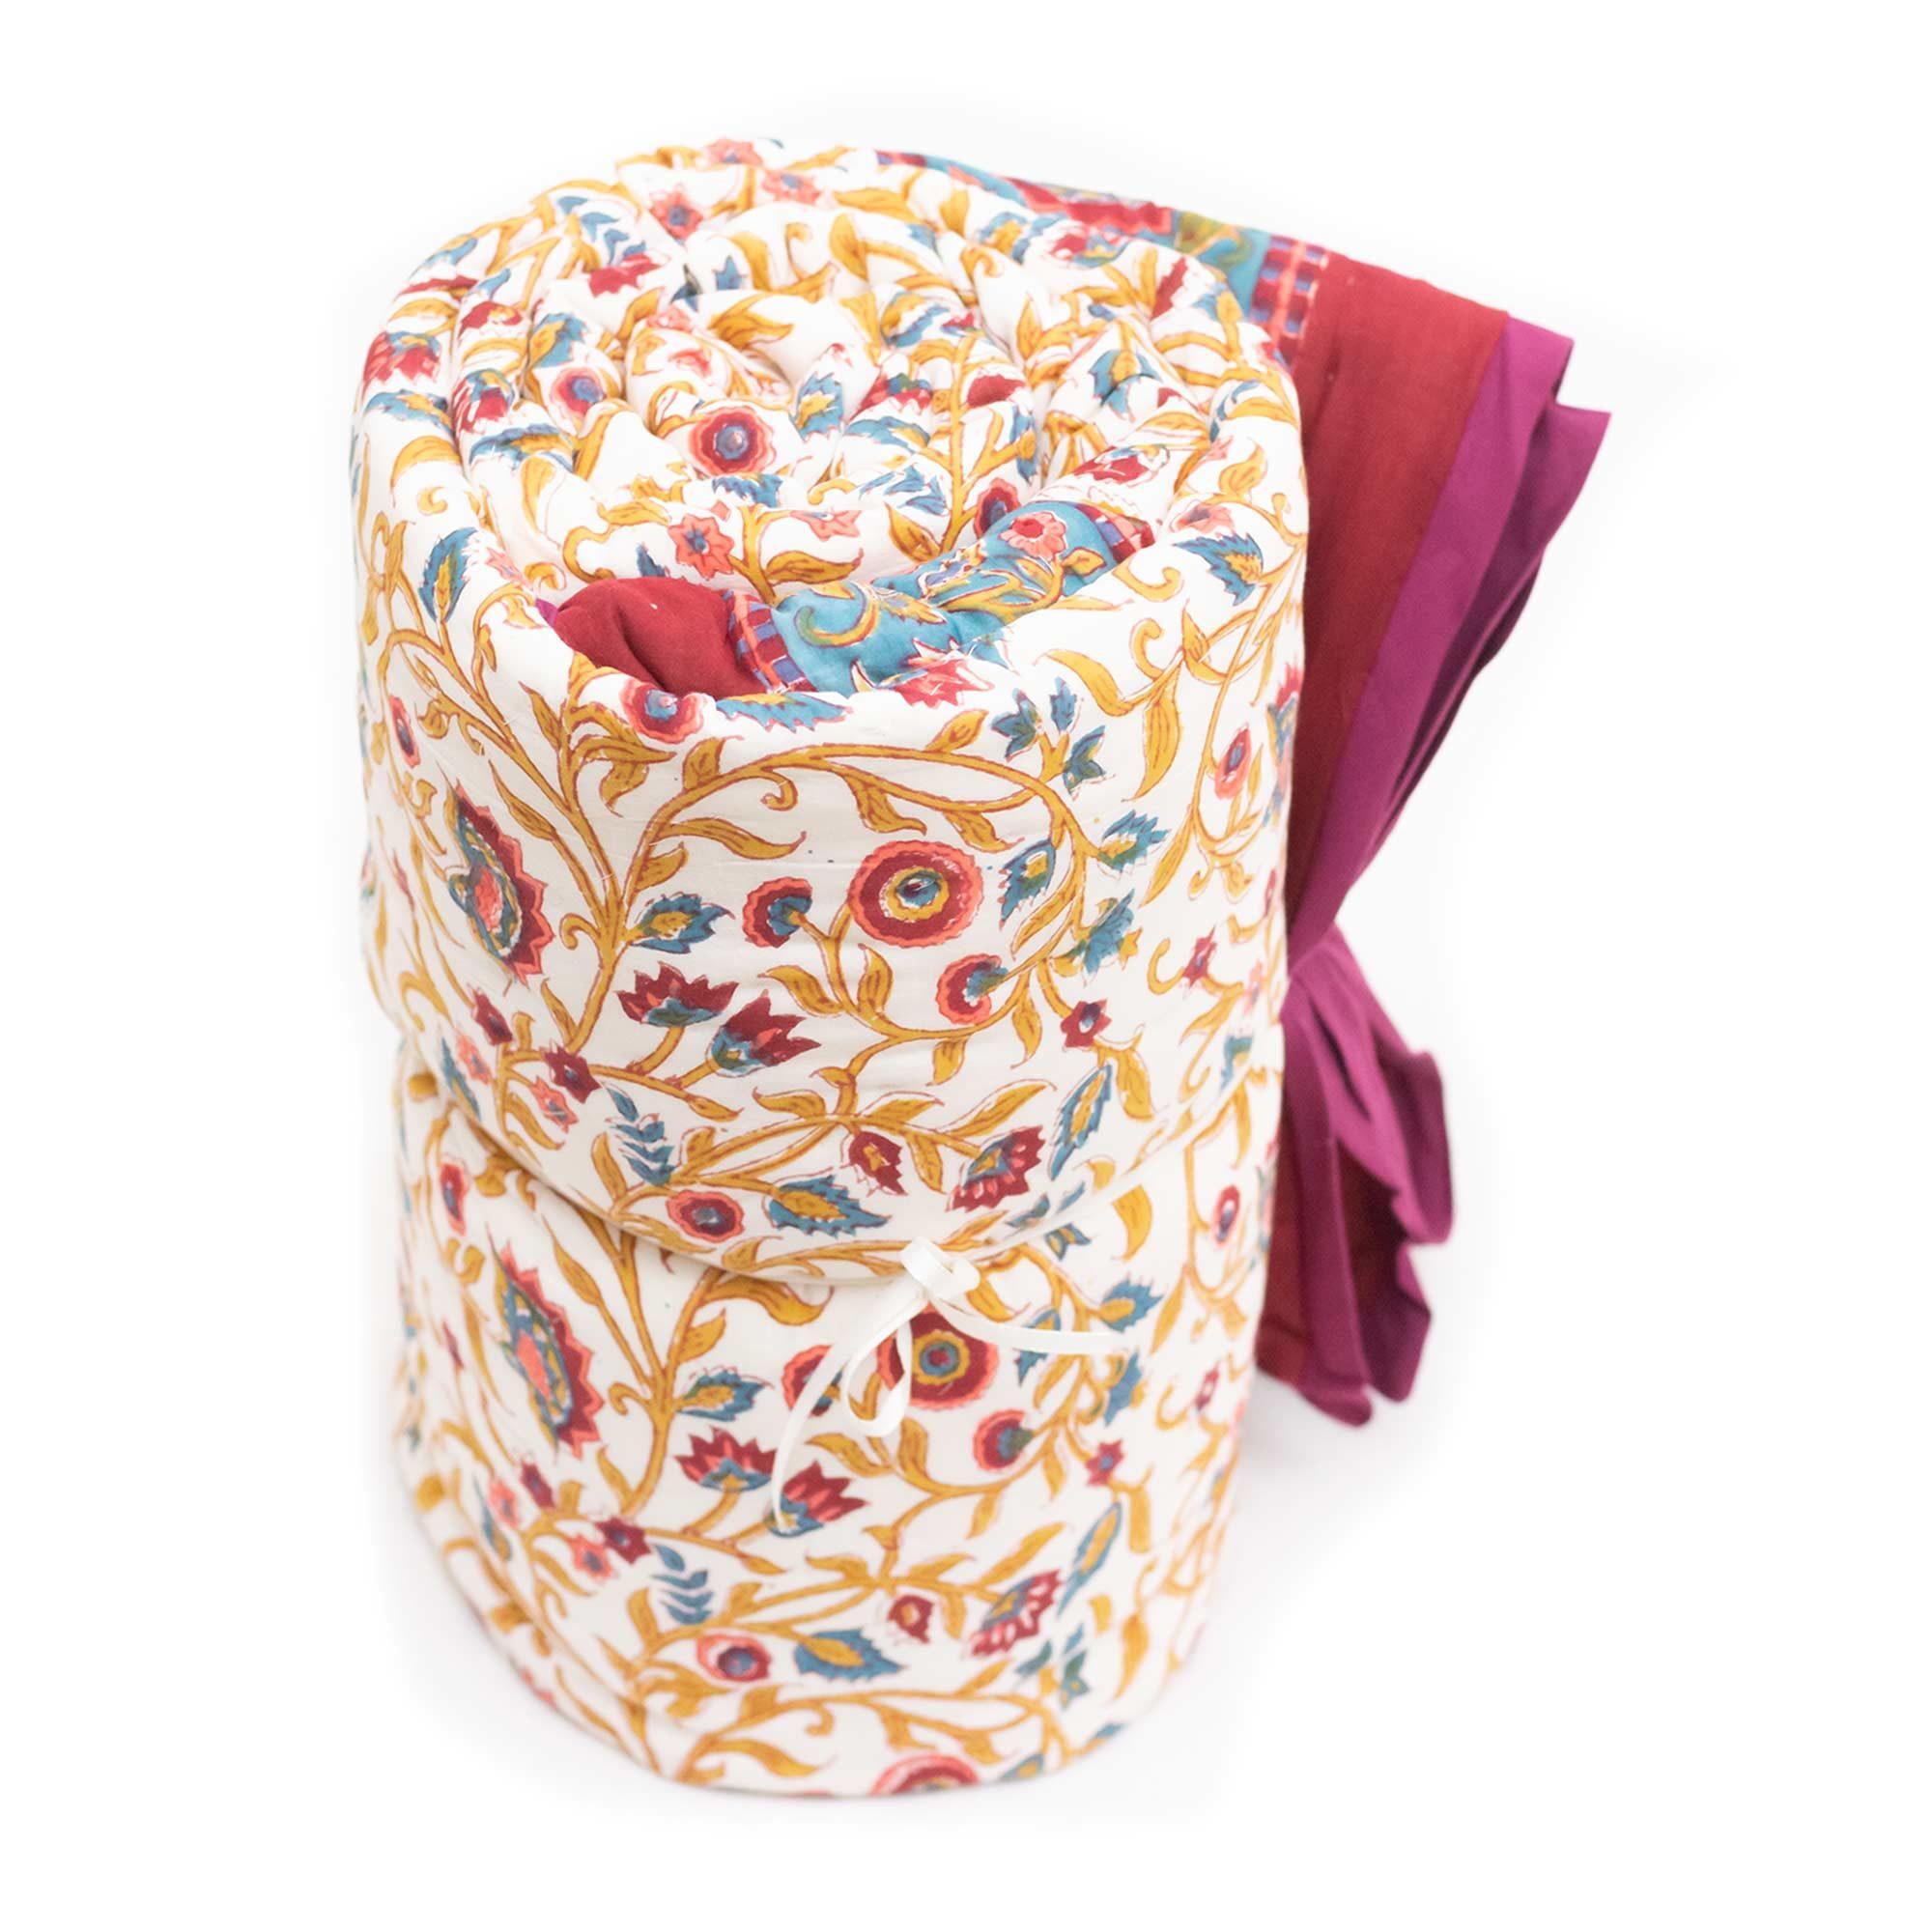 Tara-Textile - indische Decke - Kuscheldecke Mangla